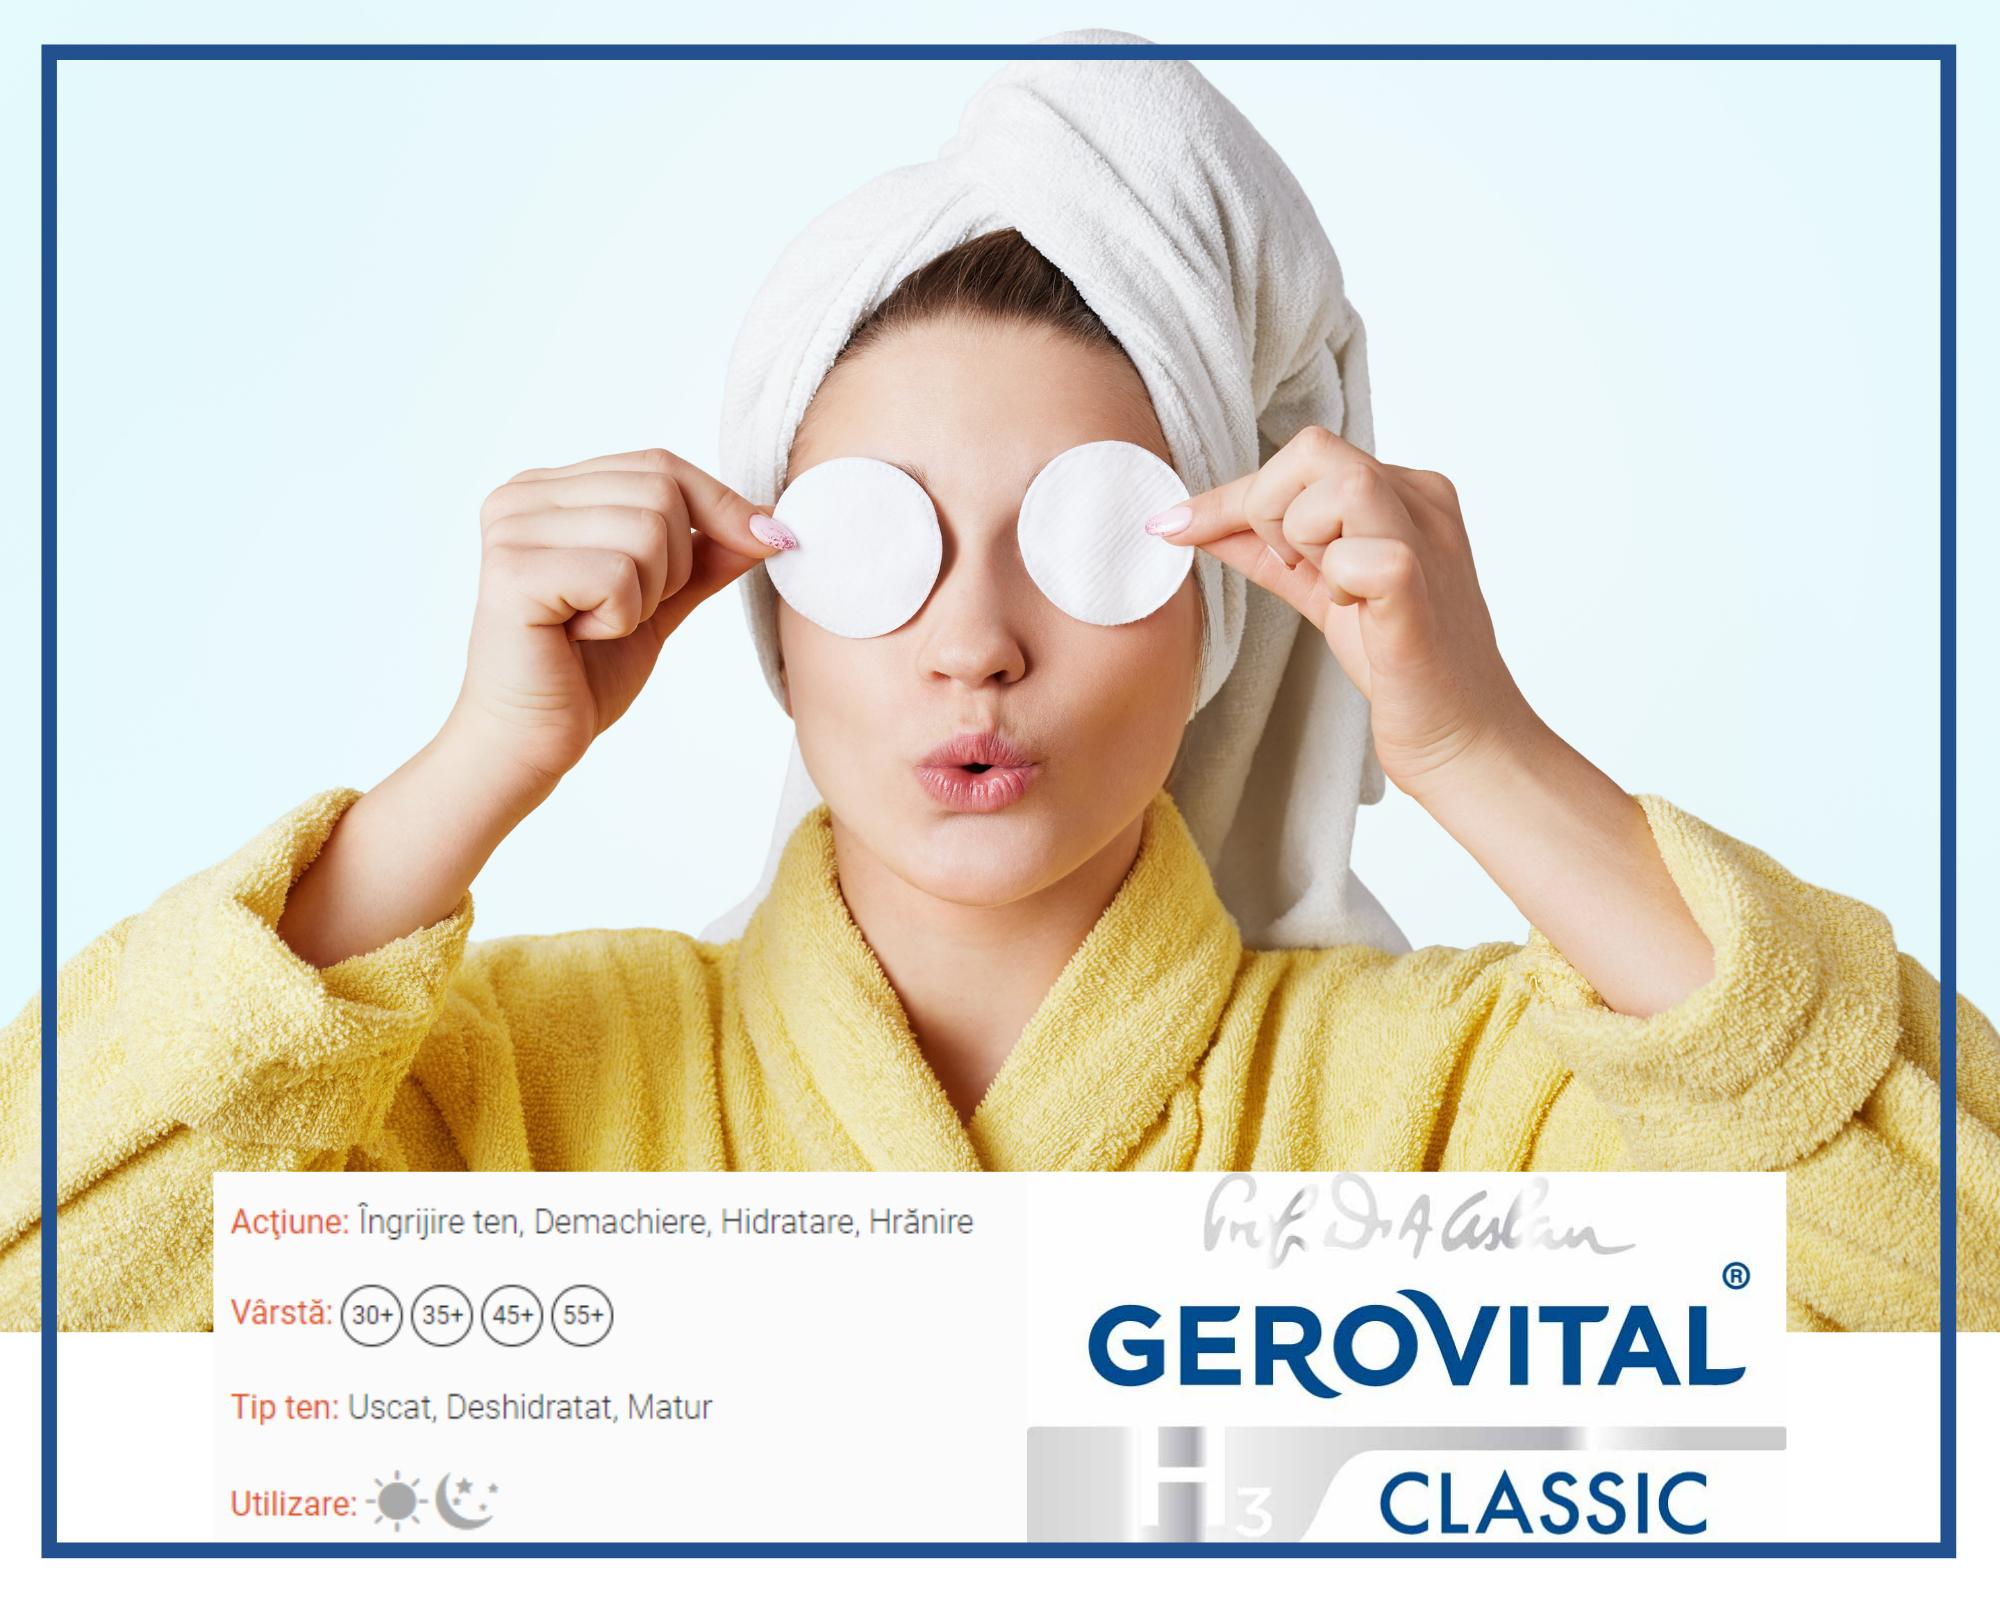 gerovital h3 classic demachiere